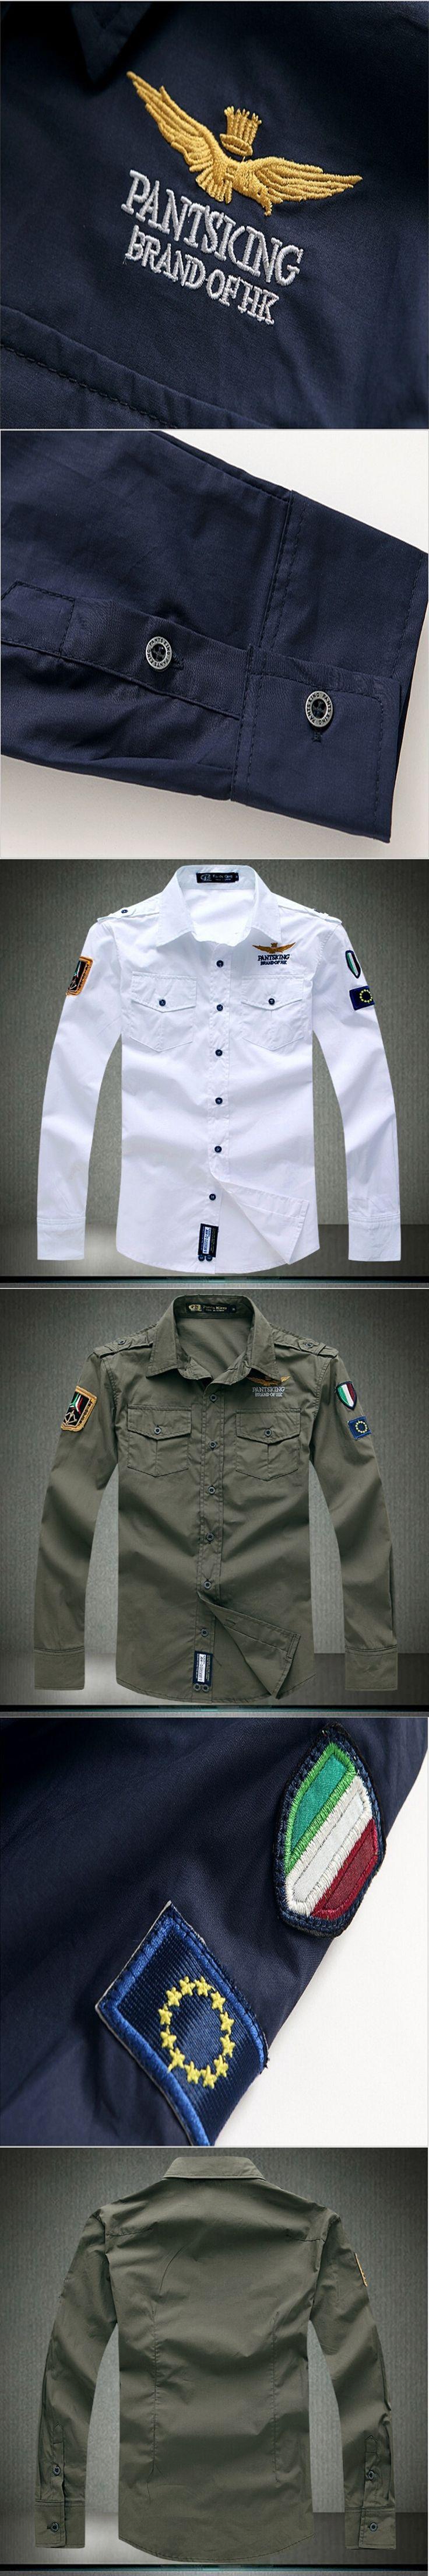 2017 Shirt Air Force One Men Shirt Long Sleeve Slim Fit Aeronautica Militare Men Dress Shirt 4XL Camisas Hombre Camisa Masculina